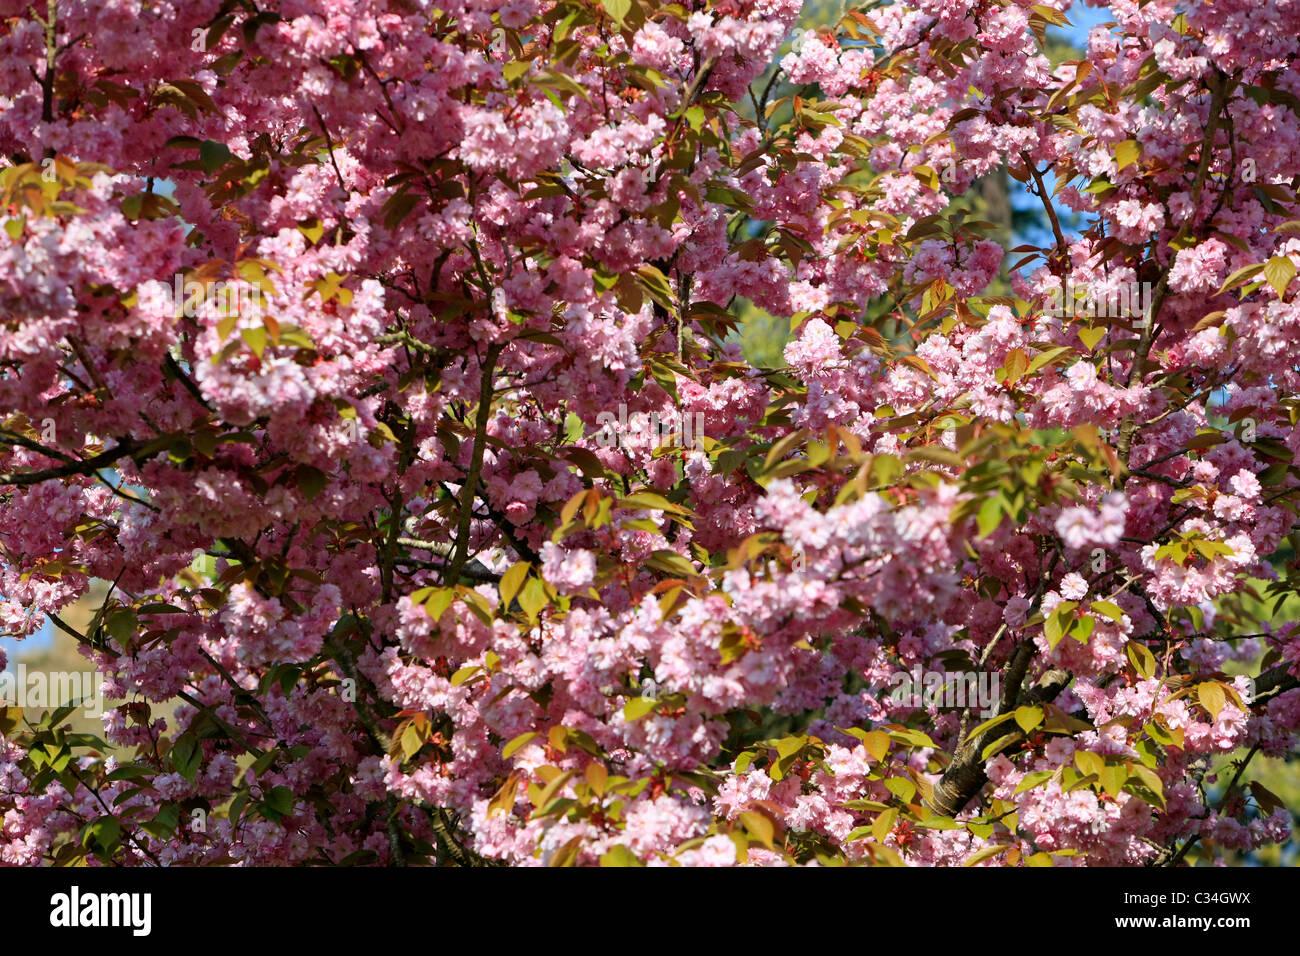 Pink Flowers Of The Ornamental Cherry Tree Stock Photo 36365782 Alamy